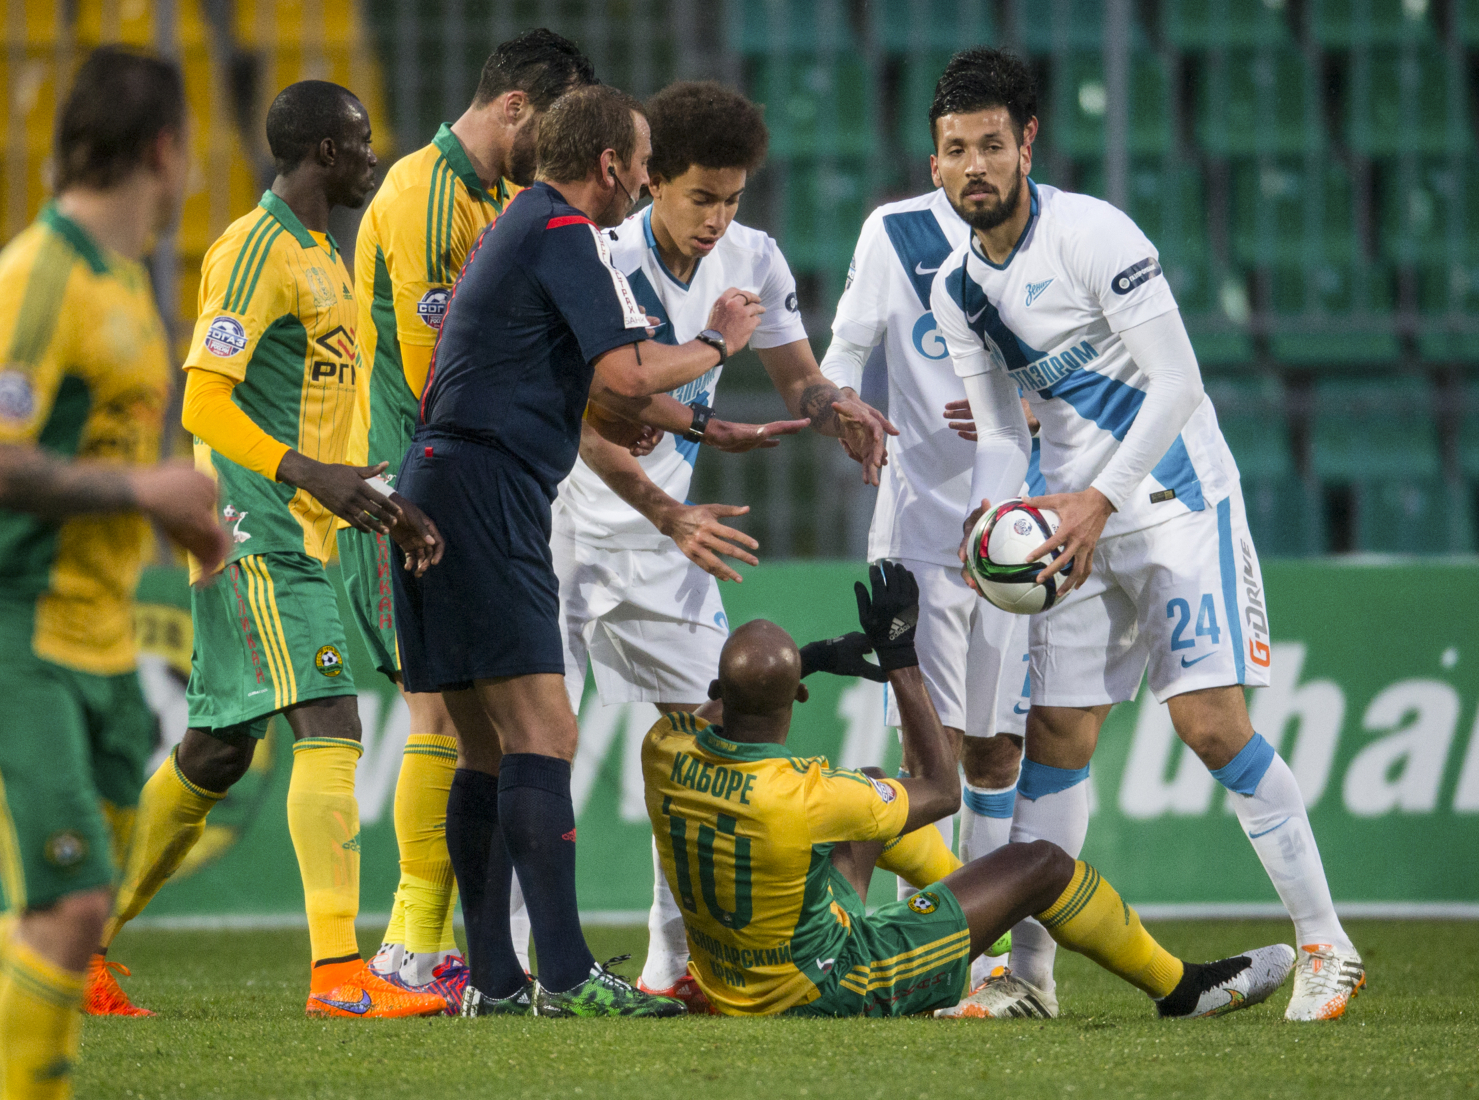 Согаз чемпионата россии по футболу